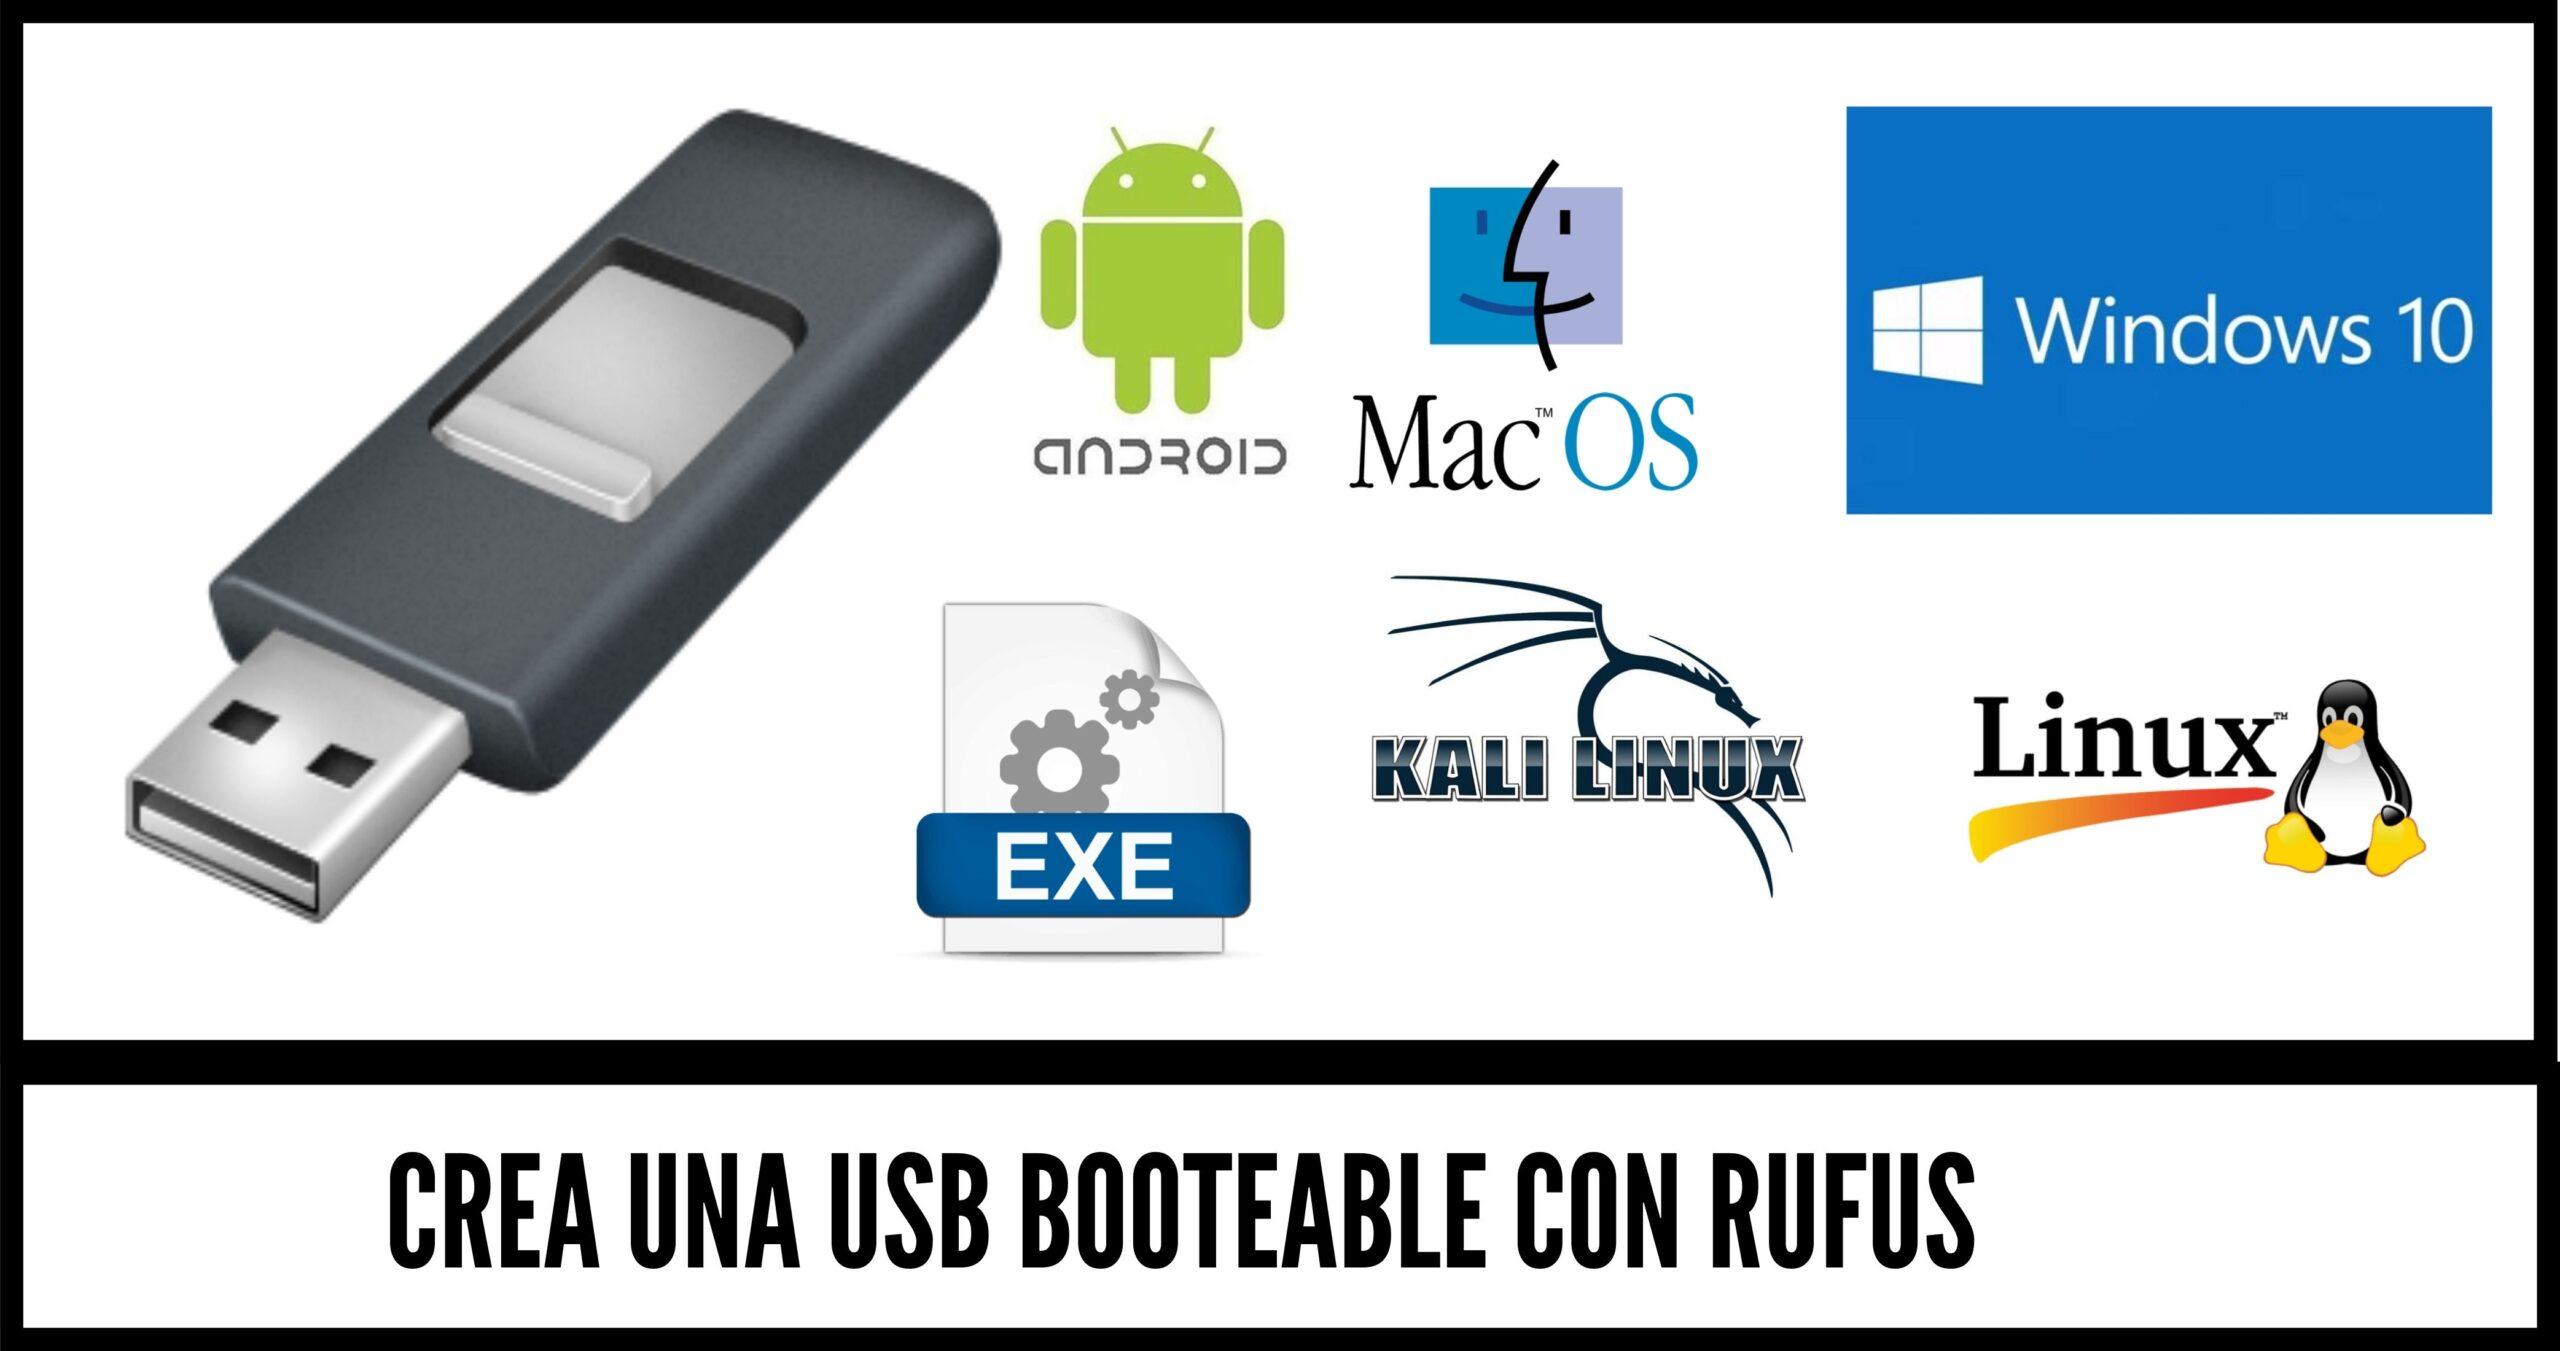 Crear una USB booteable